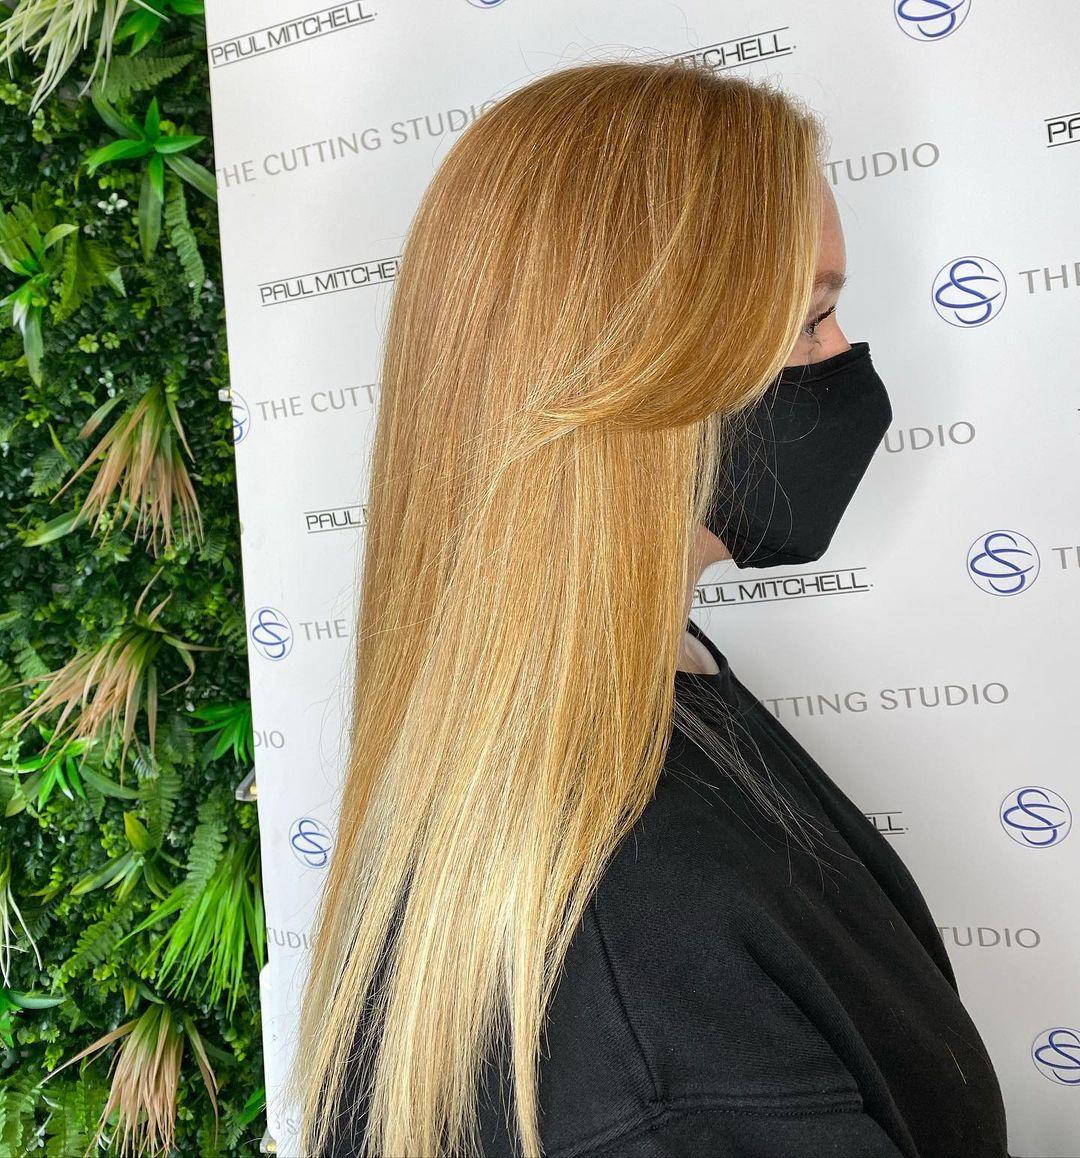 blunt cut fringes at top Hazelmere salon